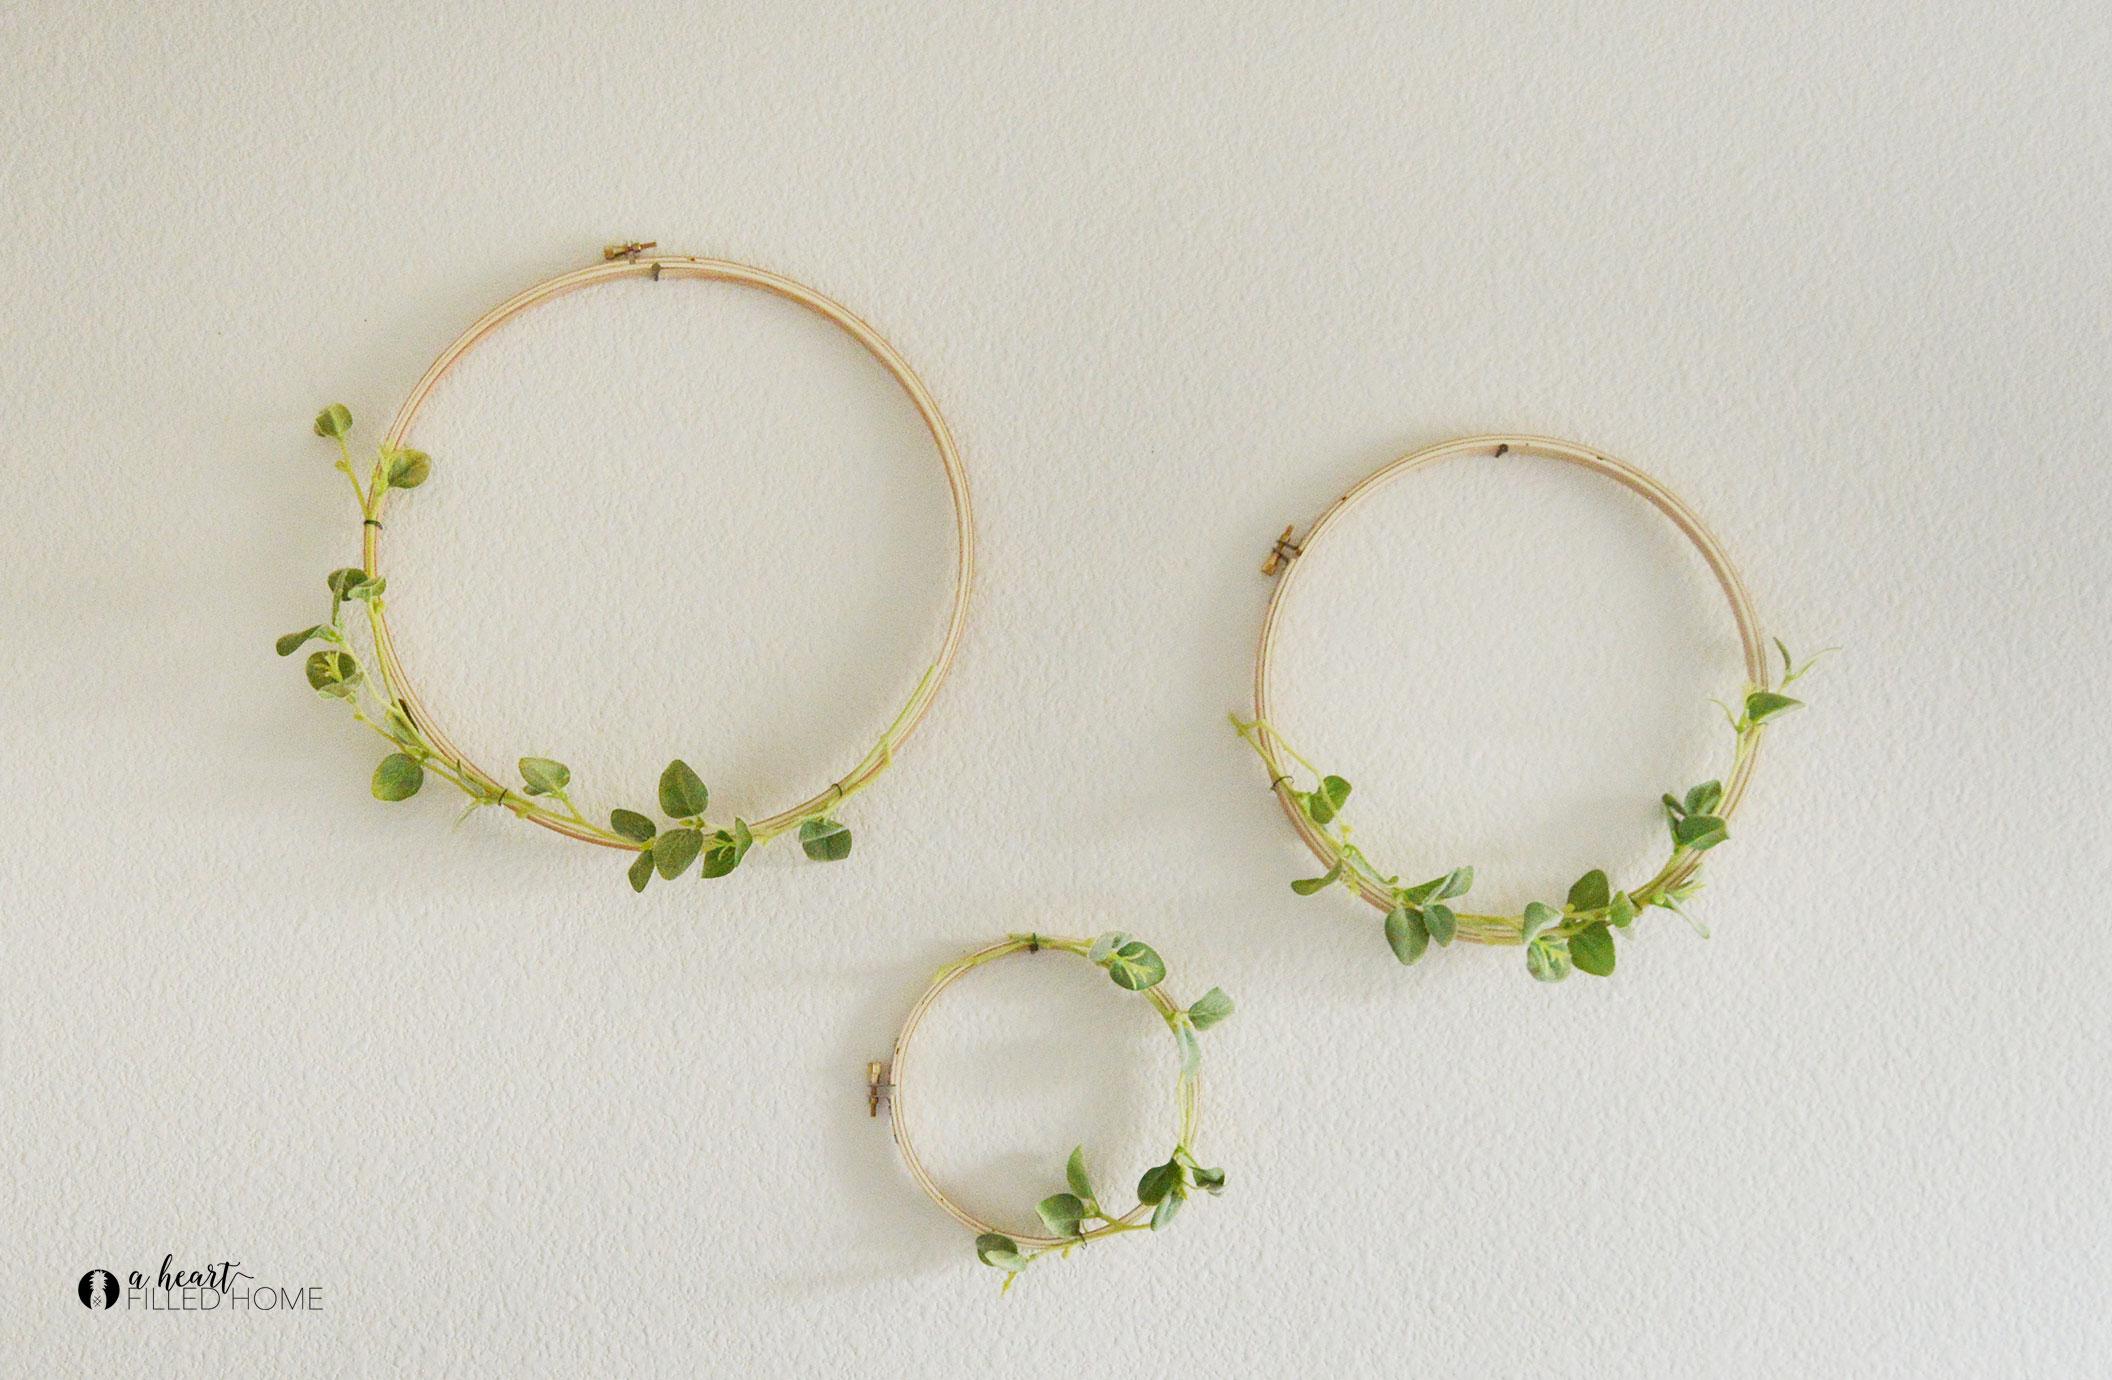 Easy DIY Hoop Wreath A Heart Filled Home DIY Home